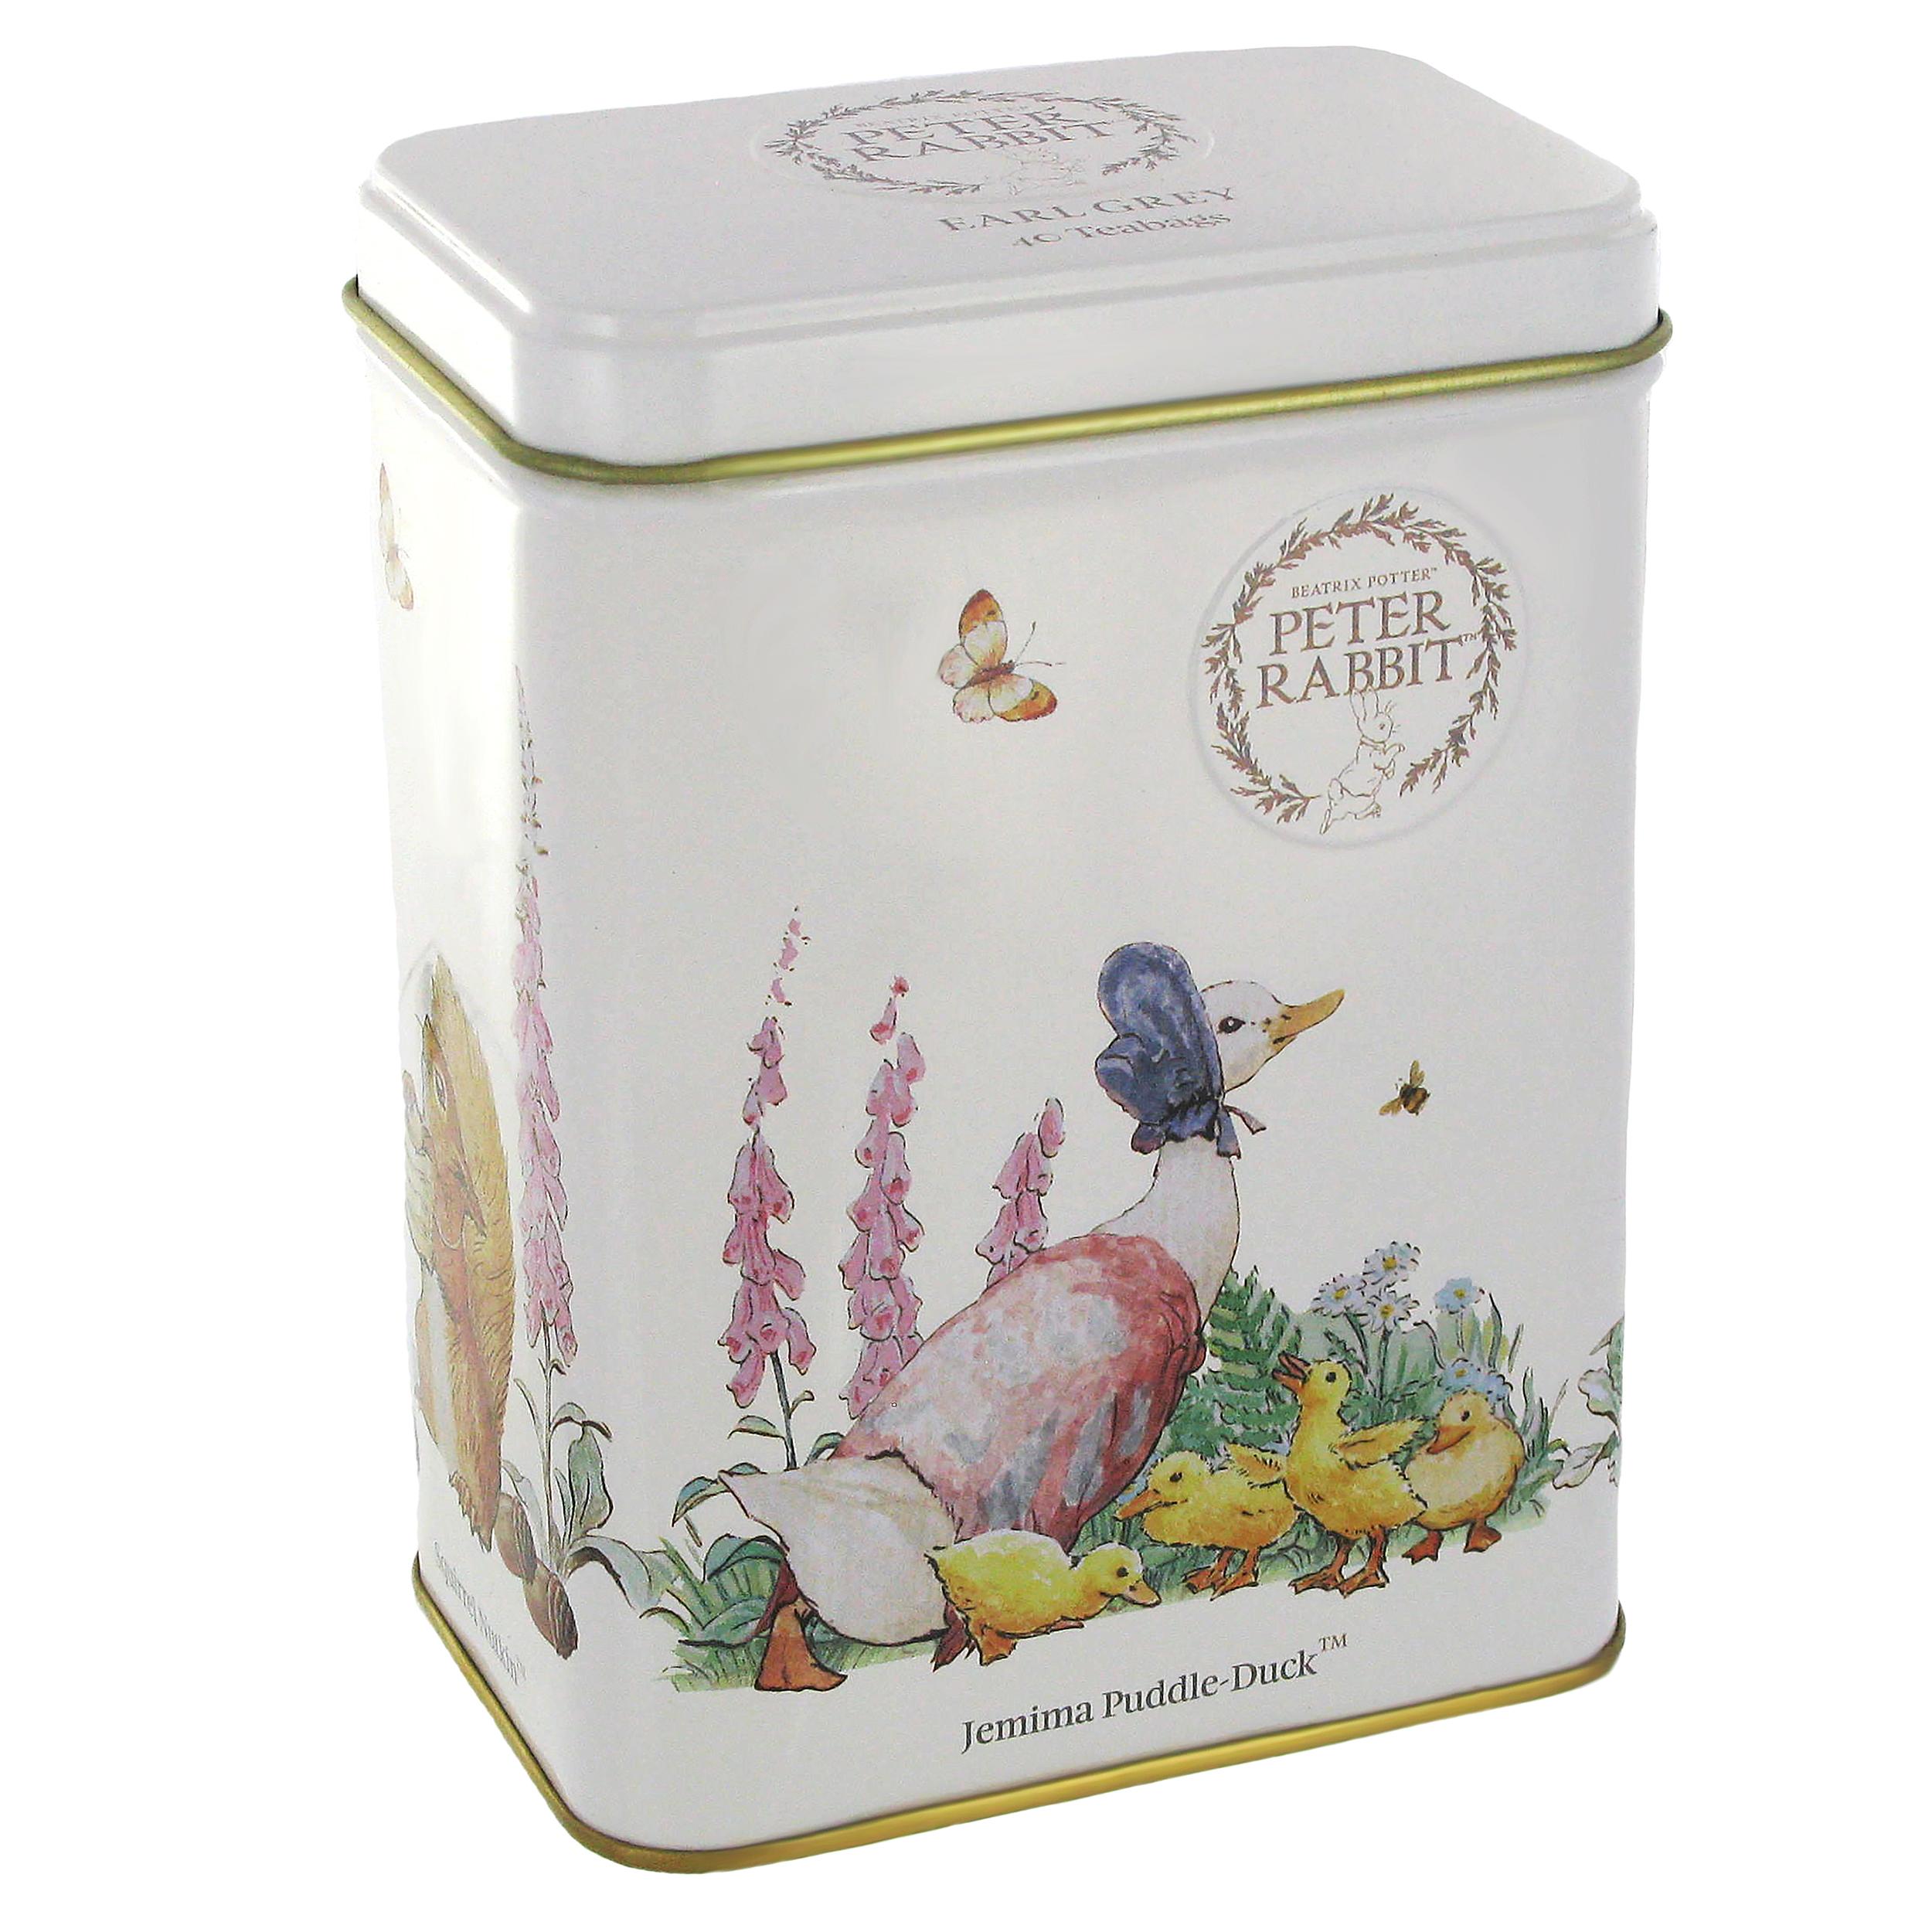 Jemima Puddle-duck tea caddy (Earl Grey tea)